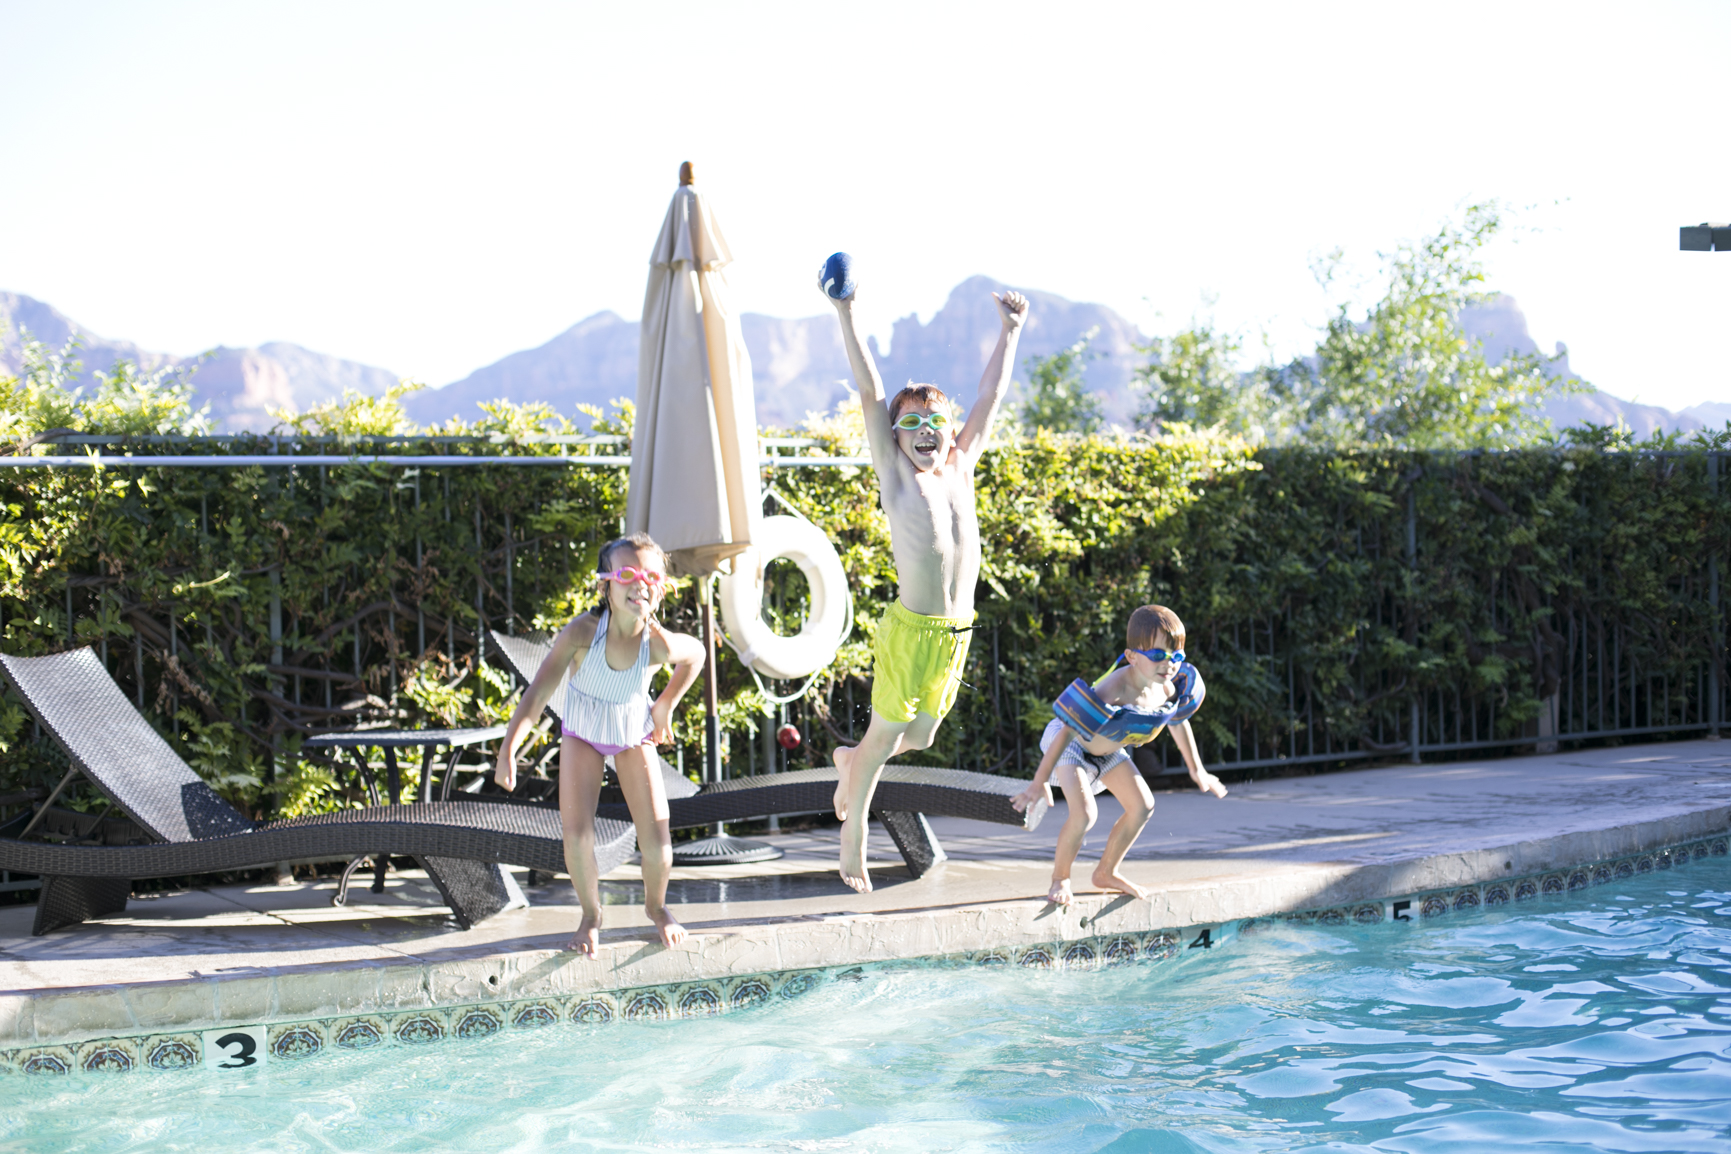 Swimming Pool at the Orchards Inn Sedona Arizona Hotel